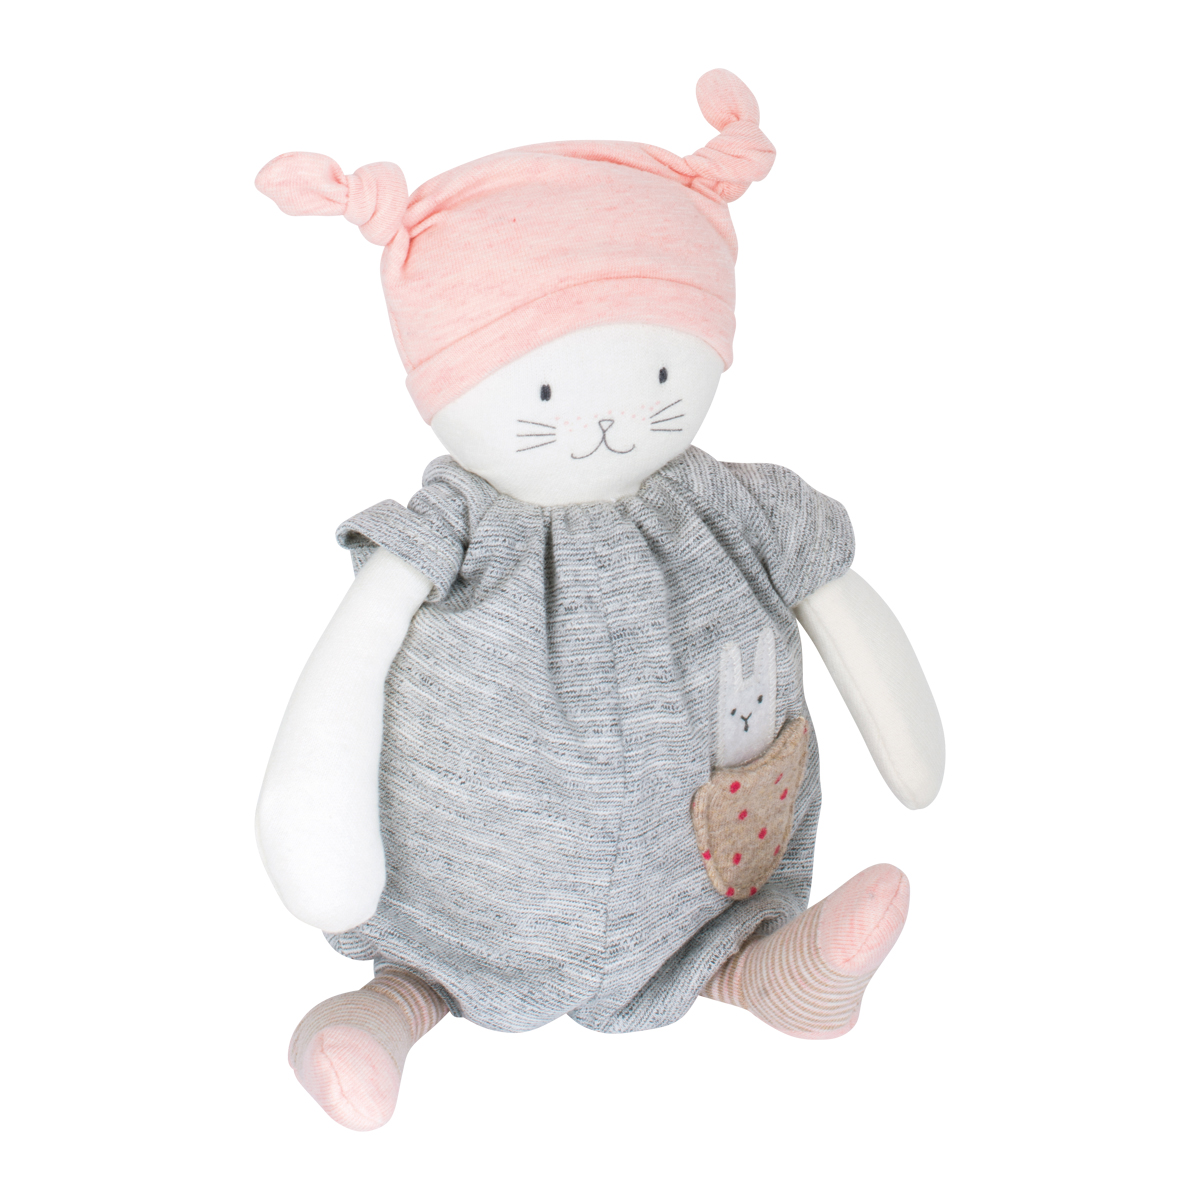 「Les PetitDodos」オルゴール ピンク帽子の妖精